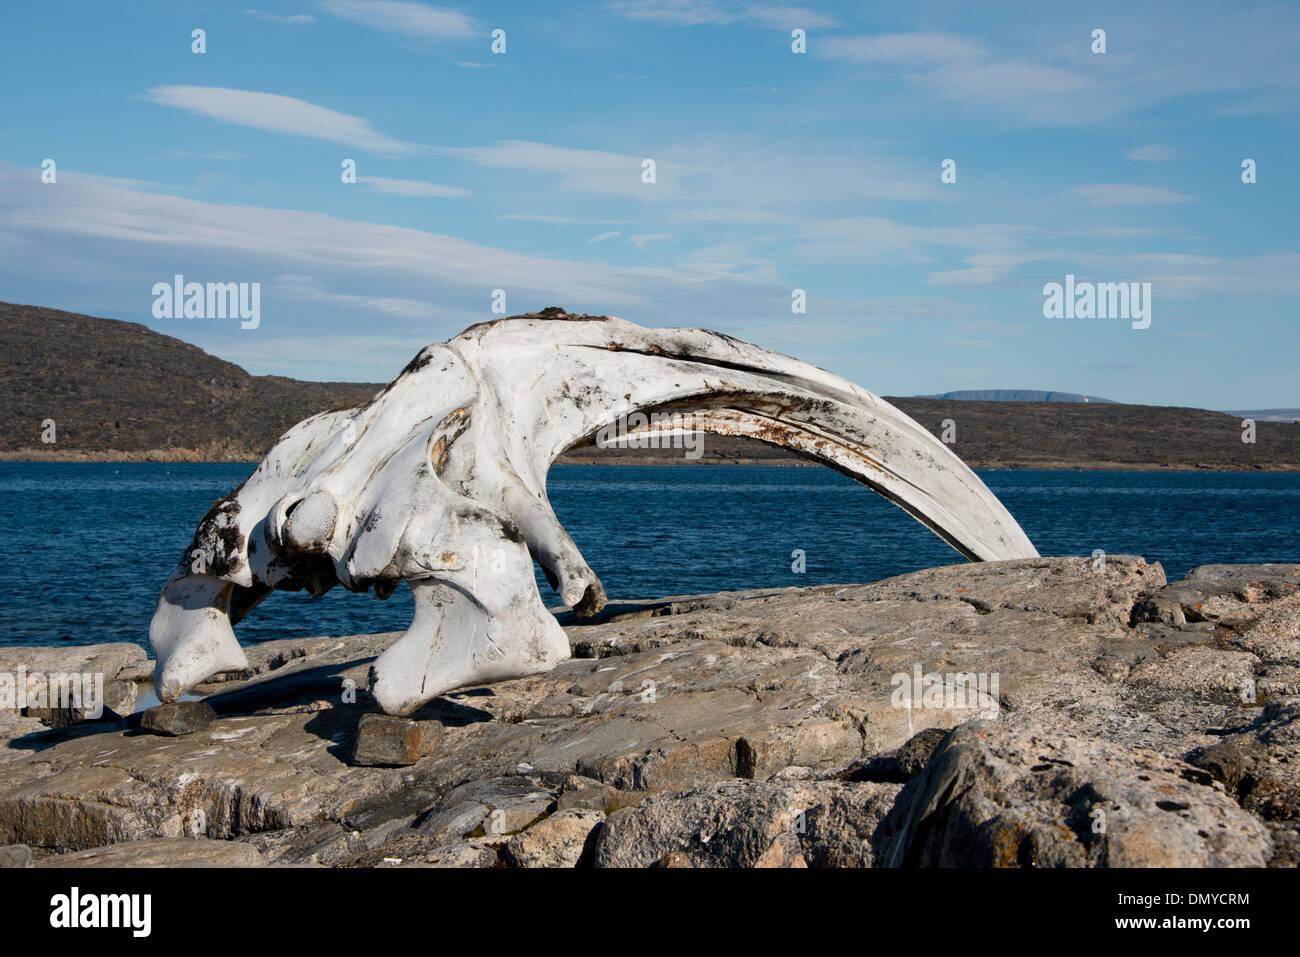 Canada, Nunavut, Qikiqtaaluk Region, Cumberland Sound, Kekerten Island. - Stock Image